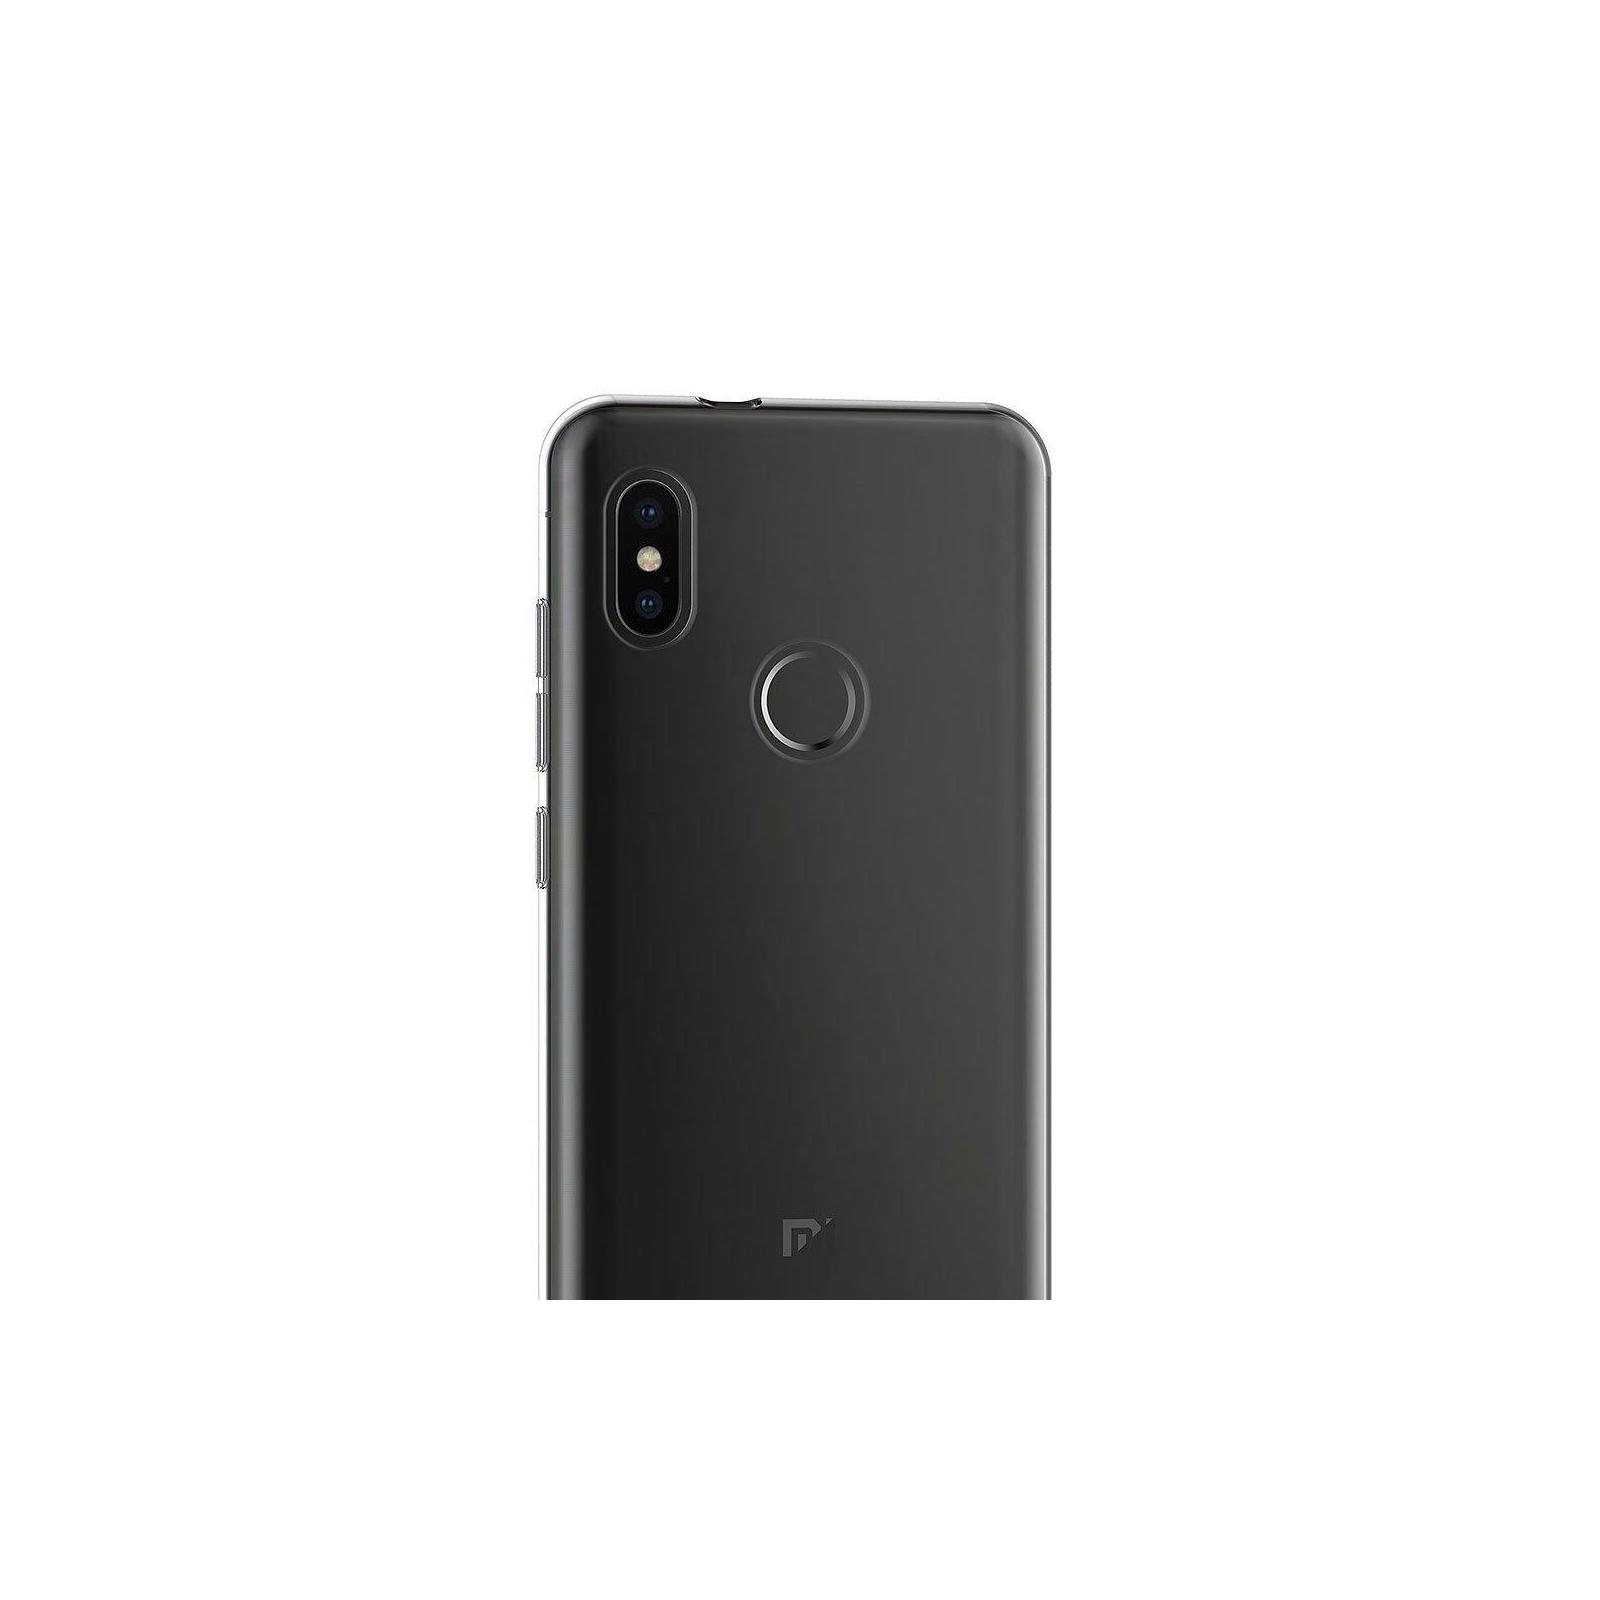 Чехол для моб. телефона Laudtec для Xiaomi Redmi Note 5 Pro Clear tpu (Transperent) (LC-XRN5P) изображение 6